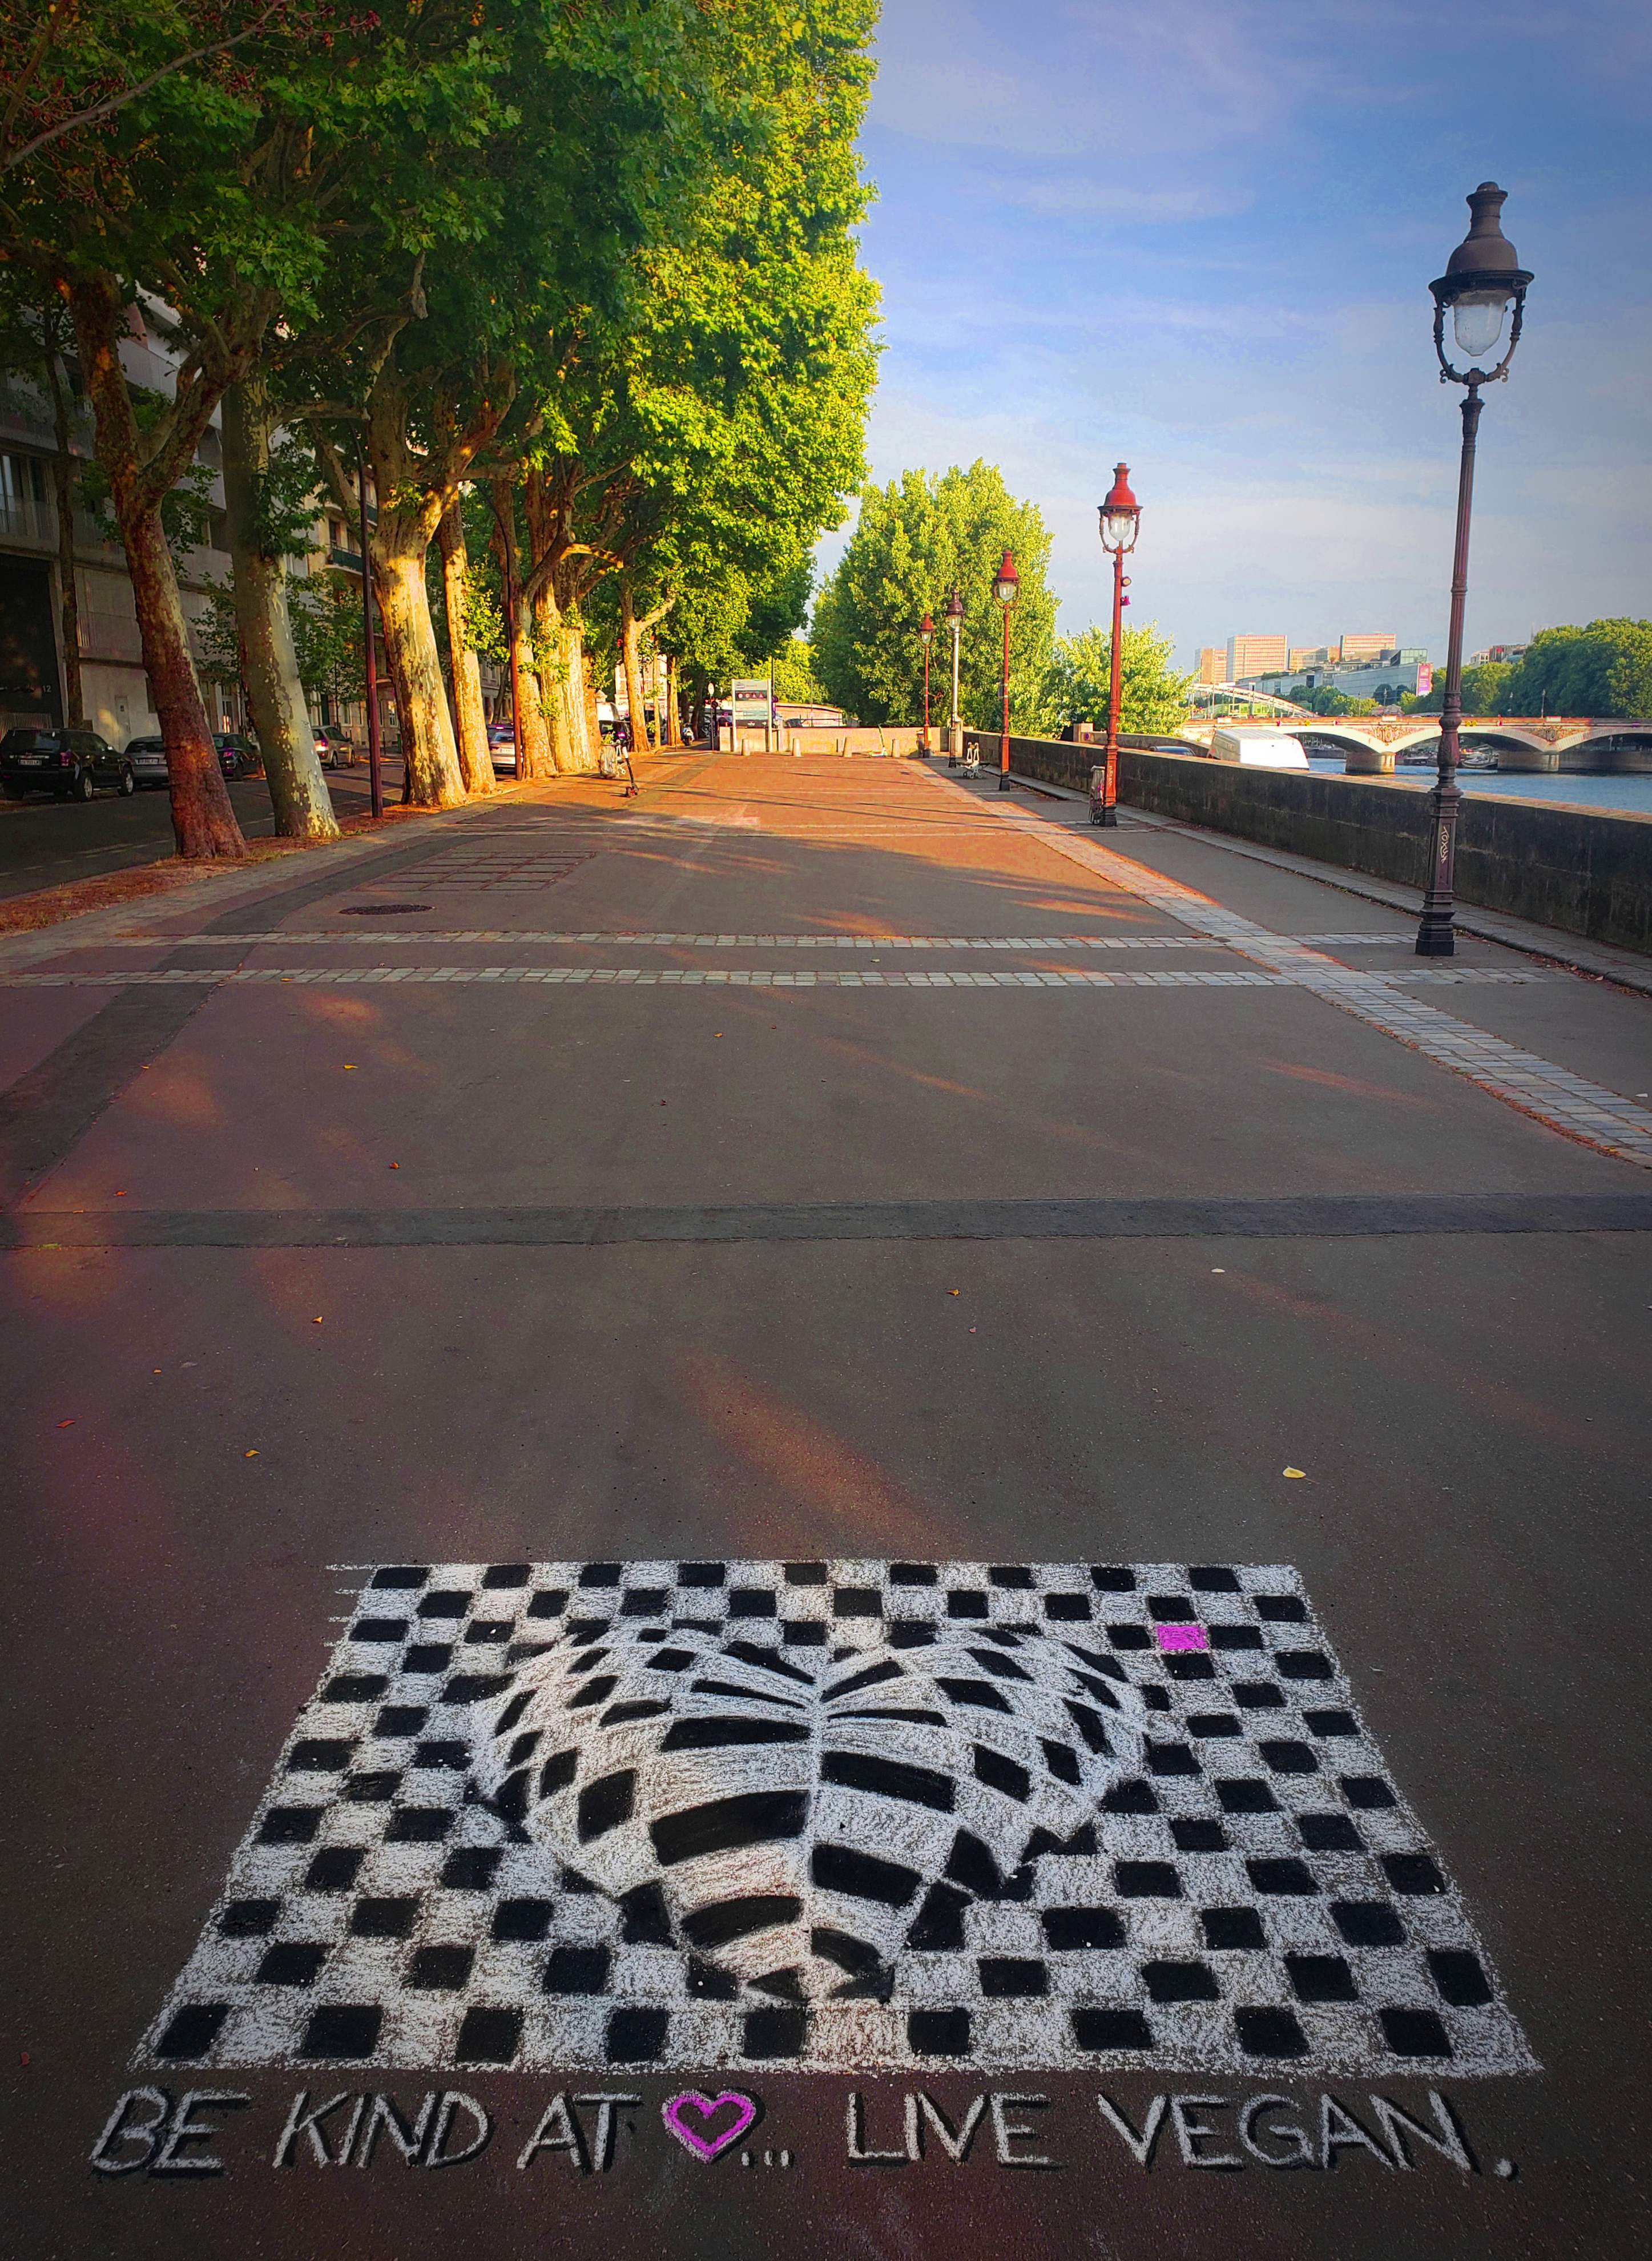 Pavement art by Nicole McLaren